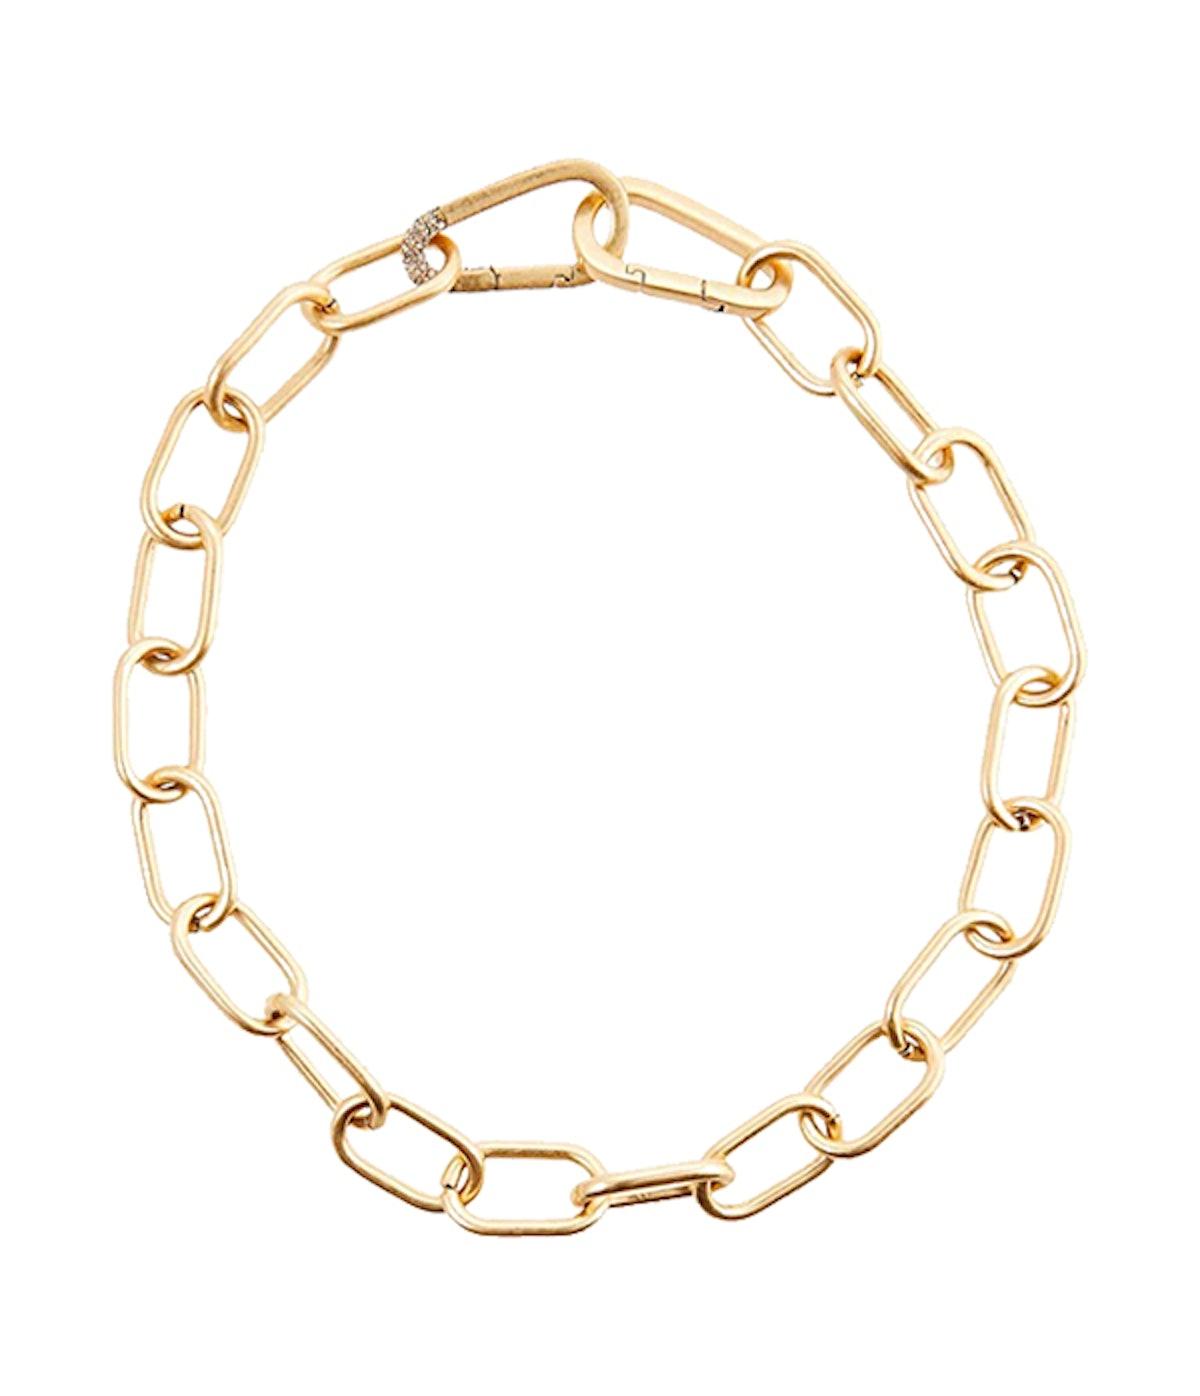 Carabiner Link Collar Necklace